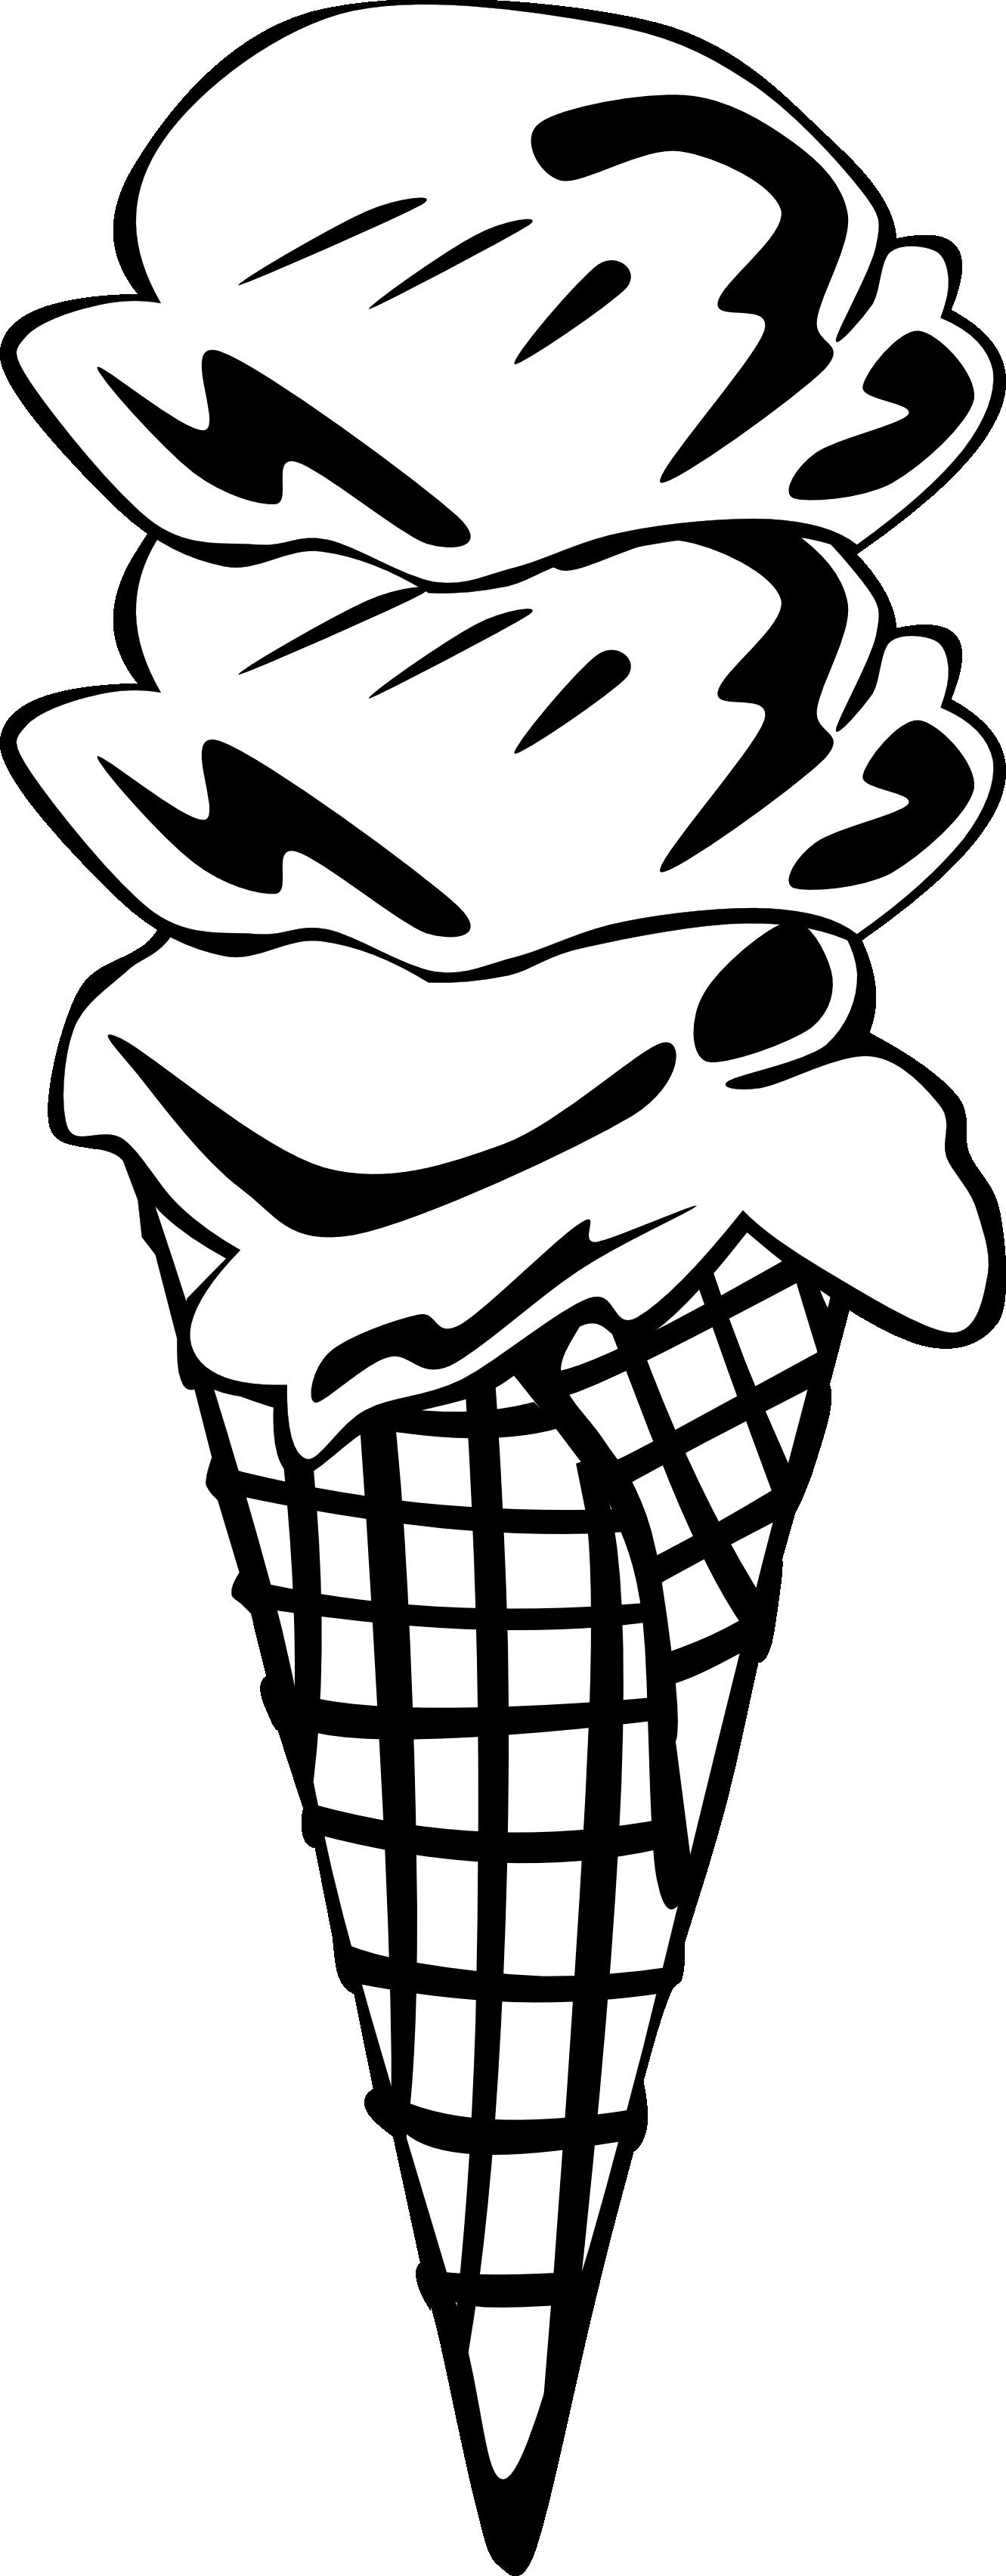 1331x3407 Ice Cream Social Clipart Black And White Clipart Panda